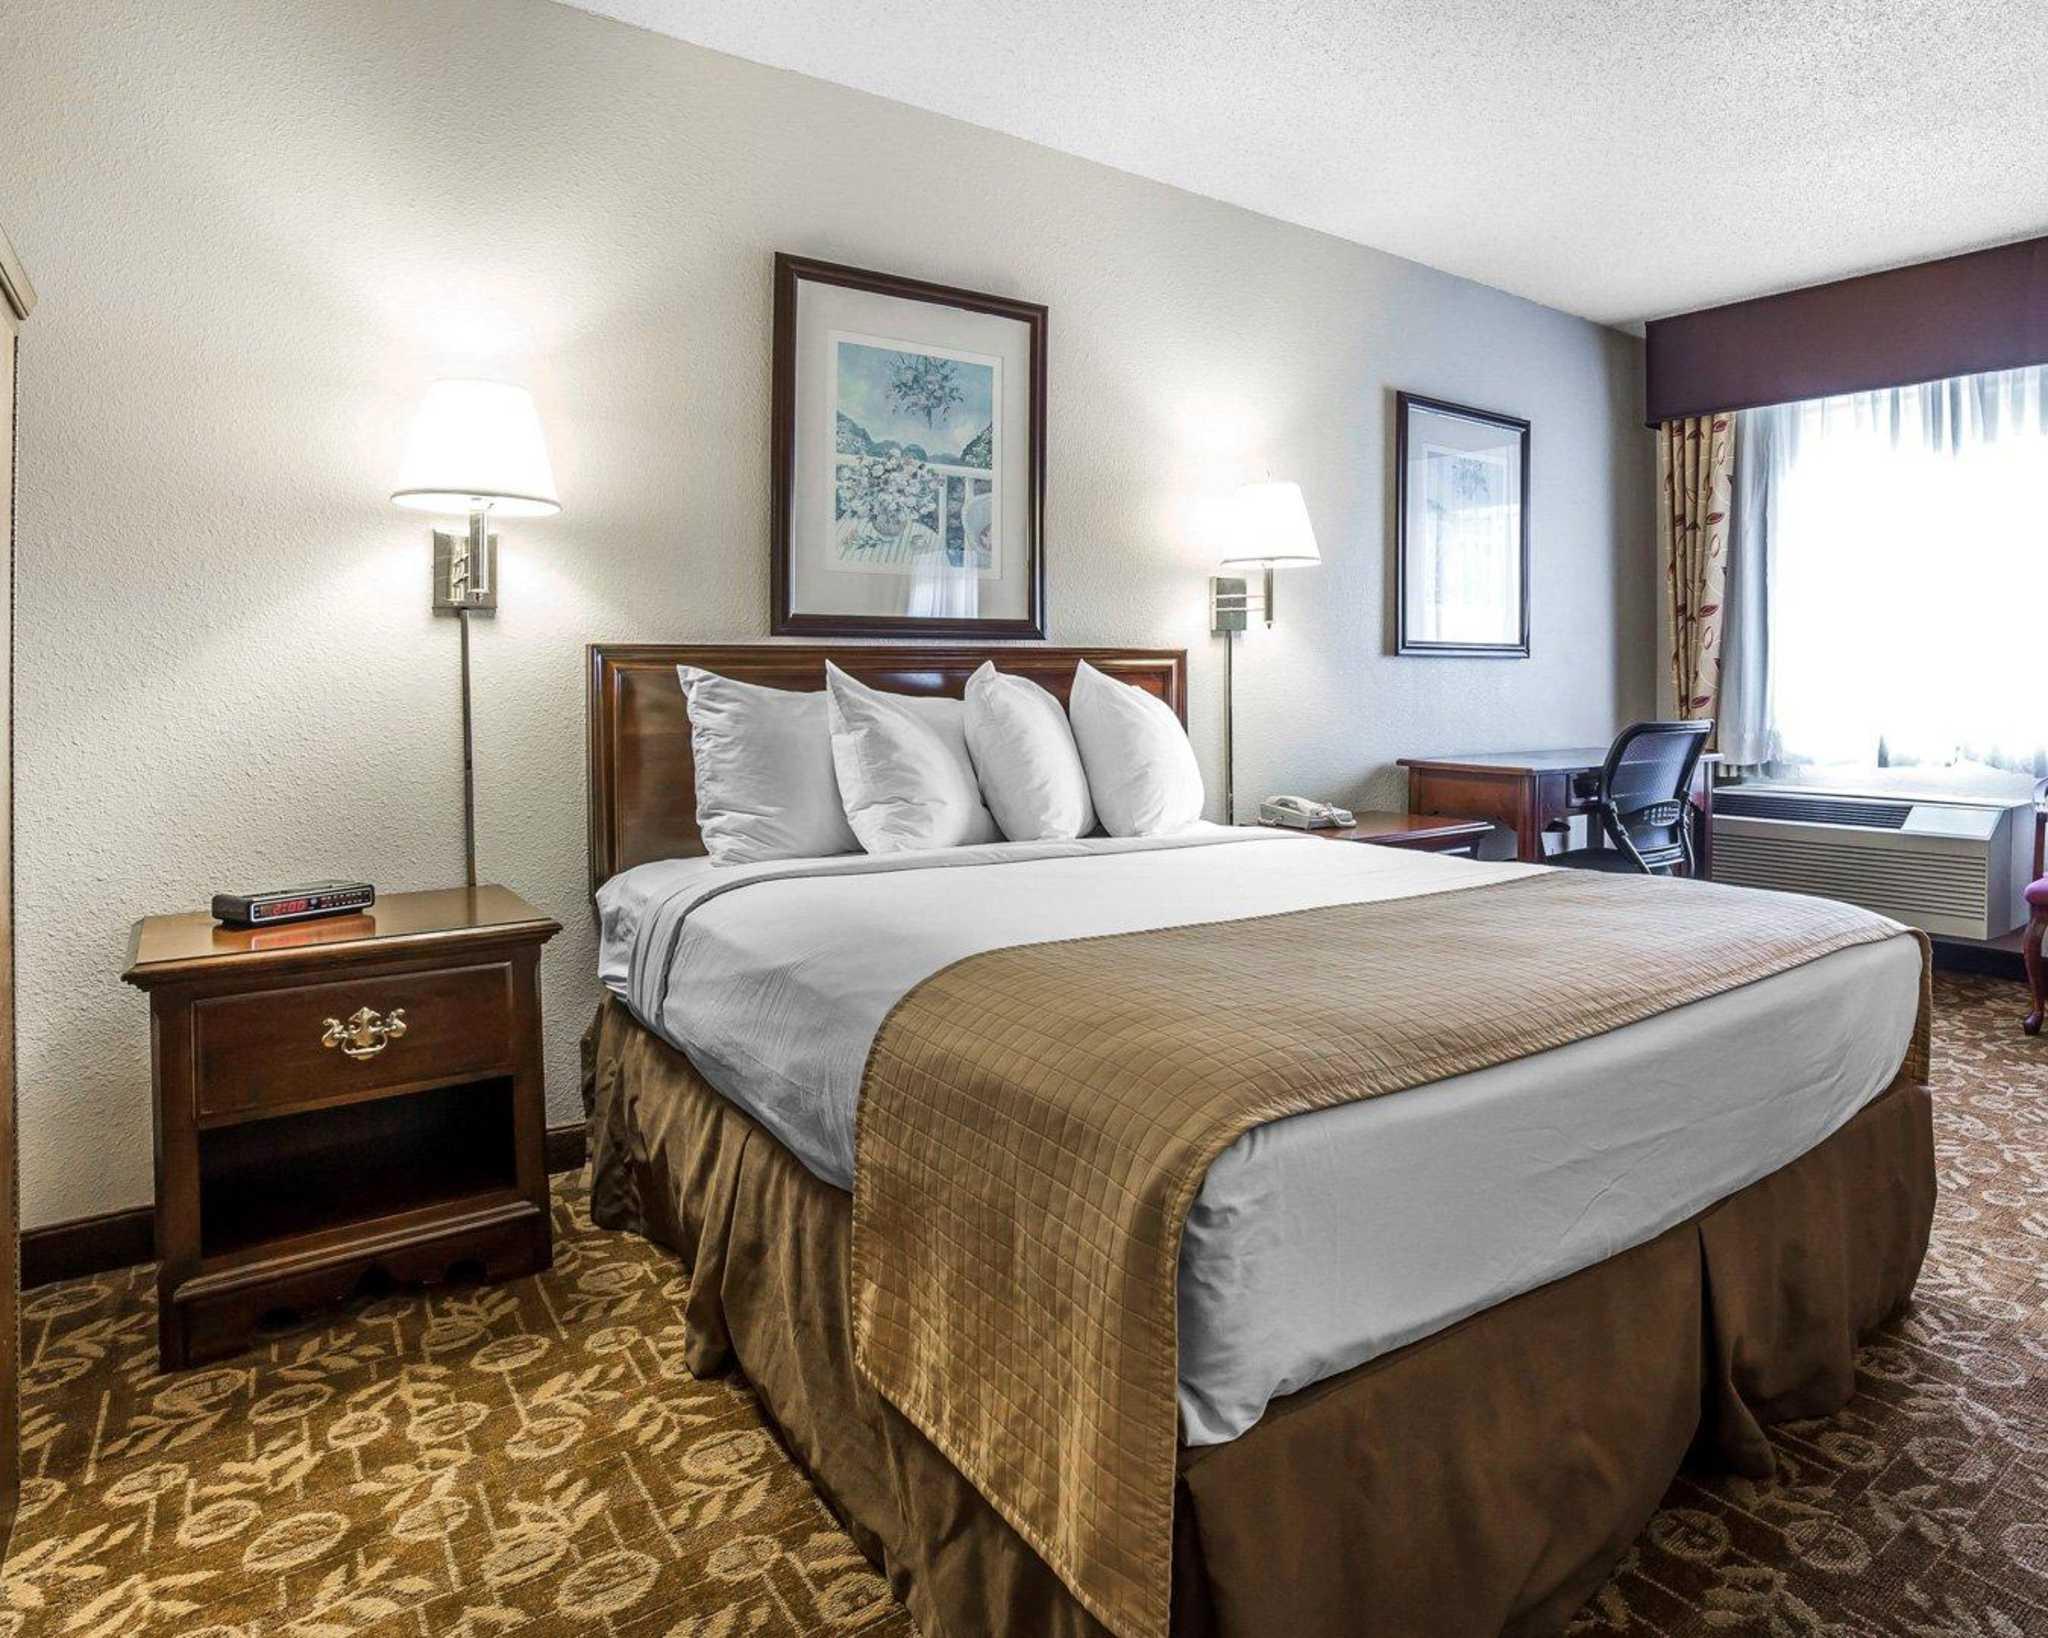 Quality Inn & Suites Minden US-395 image 6